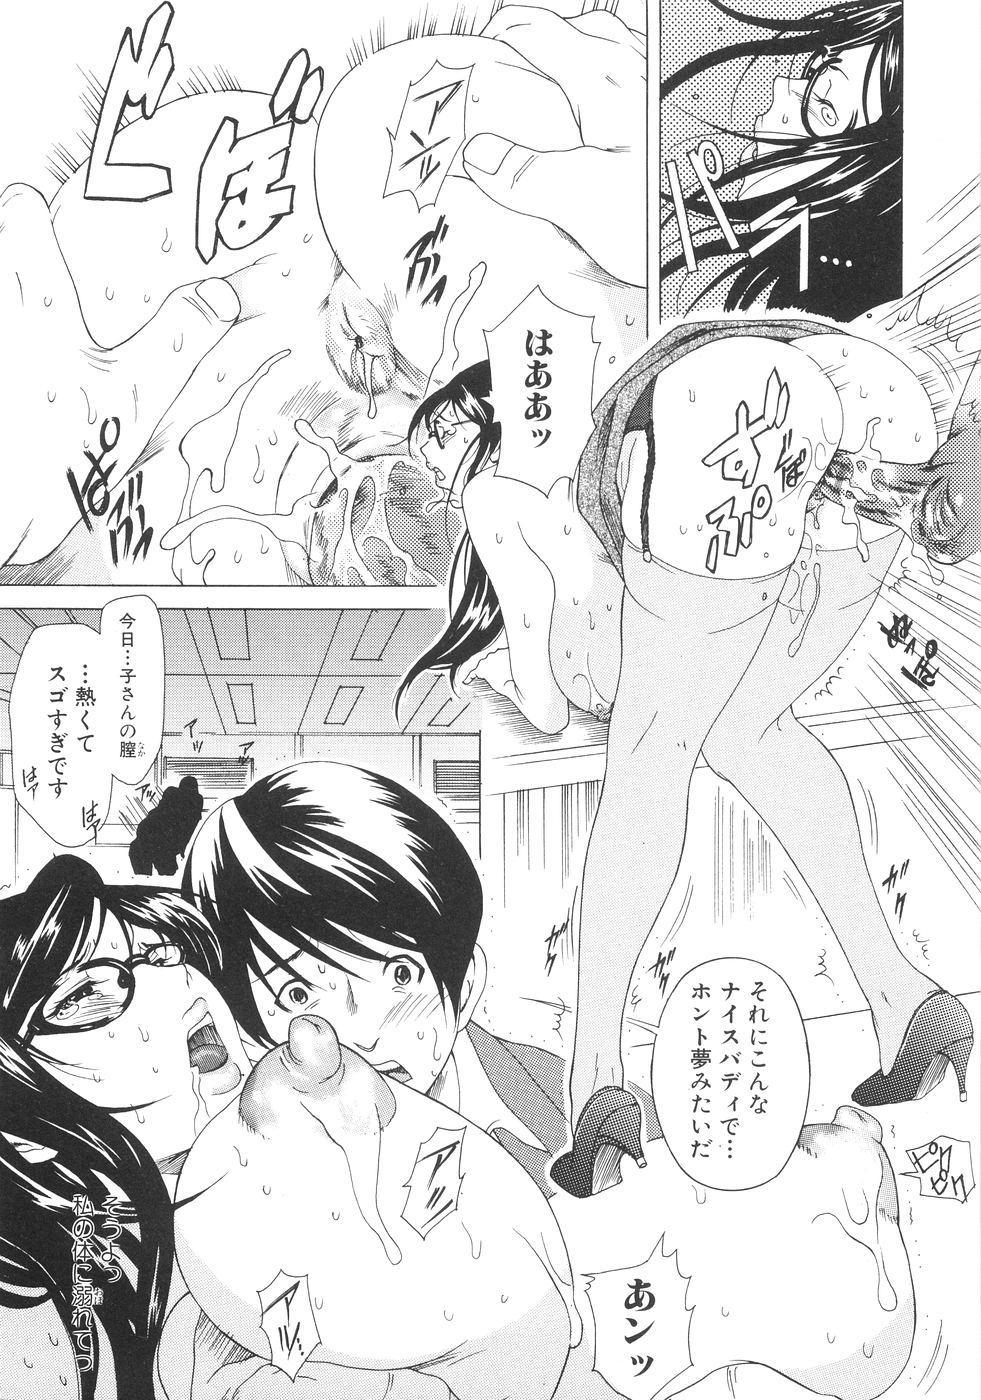 Honki Jiru - Cowper's Gland Liquid? or Love Juice?...?! 47